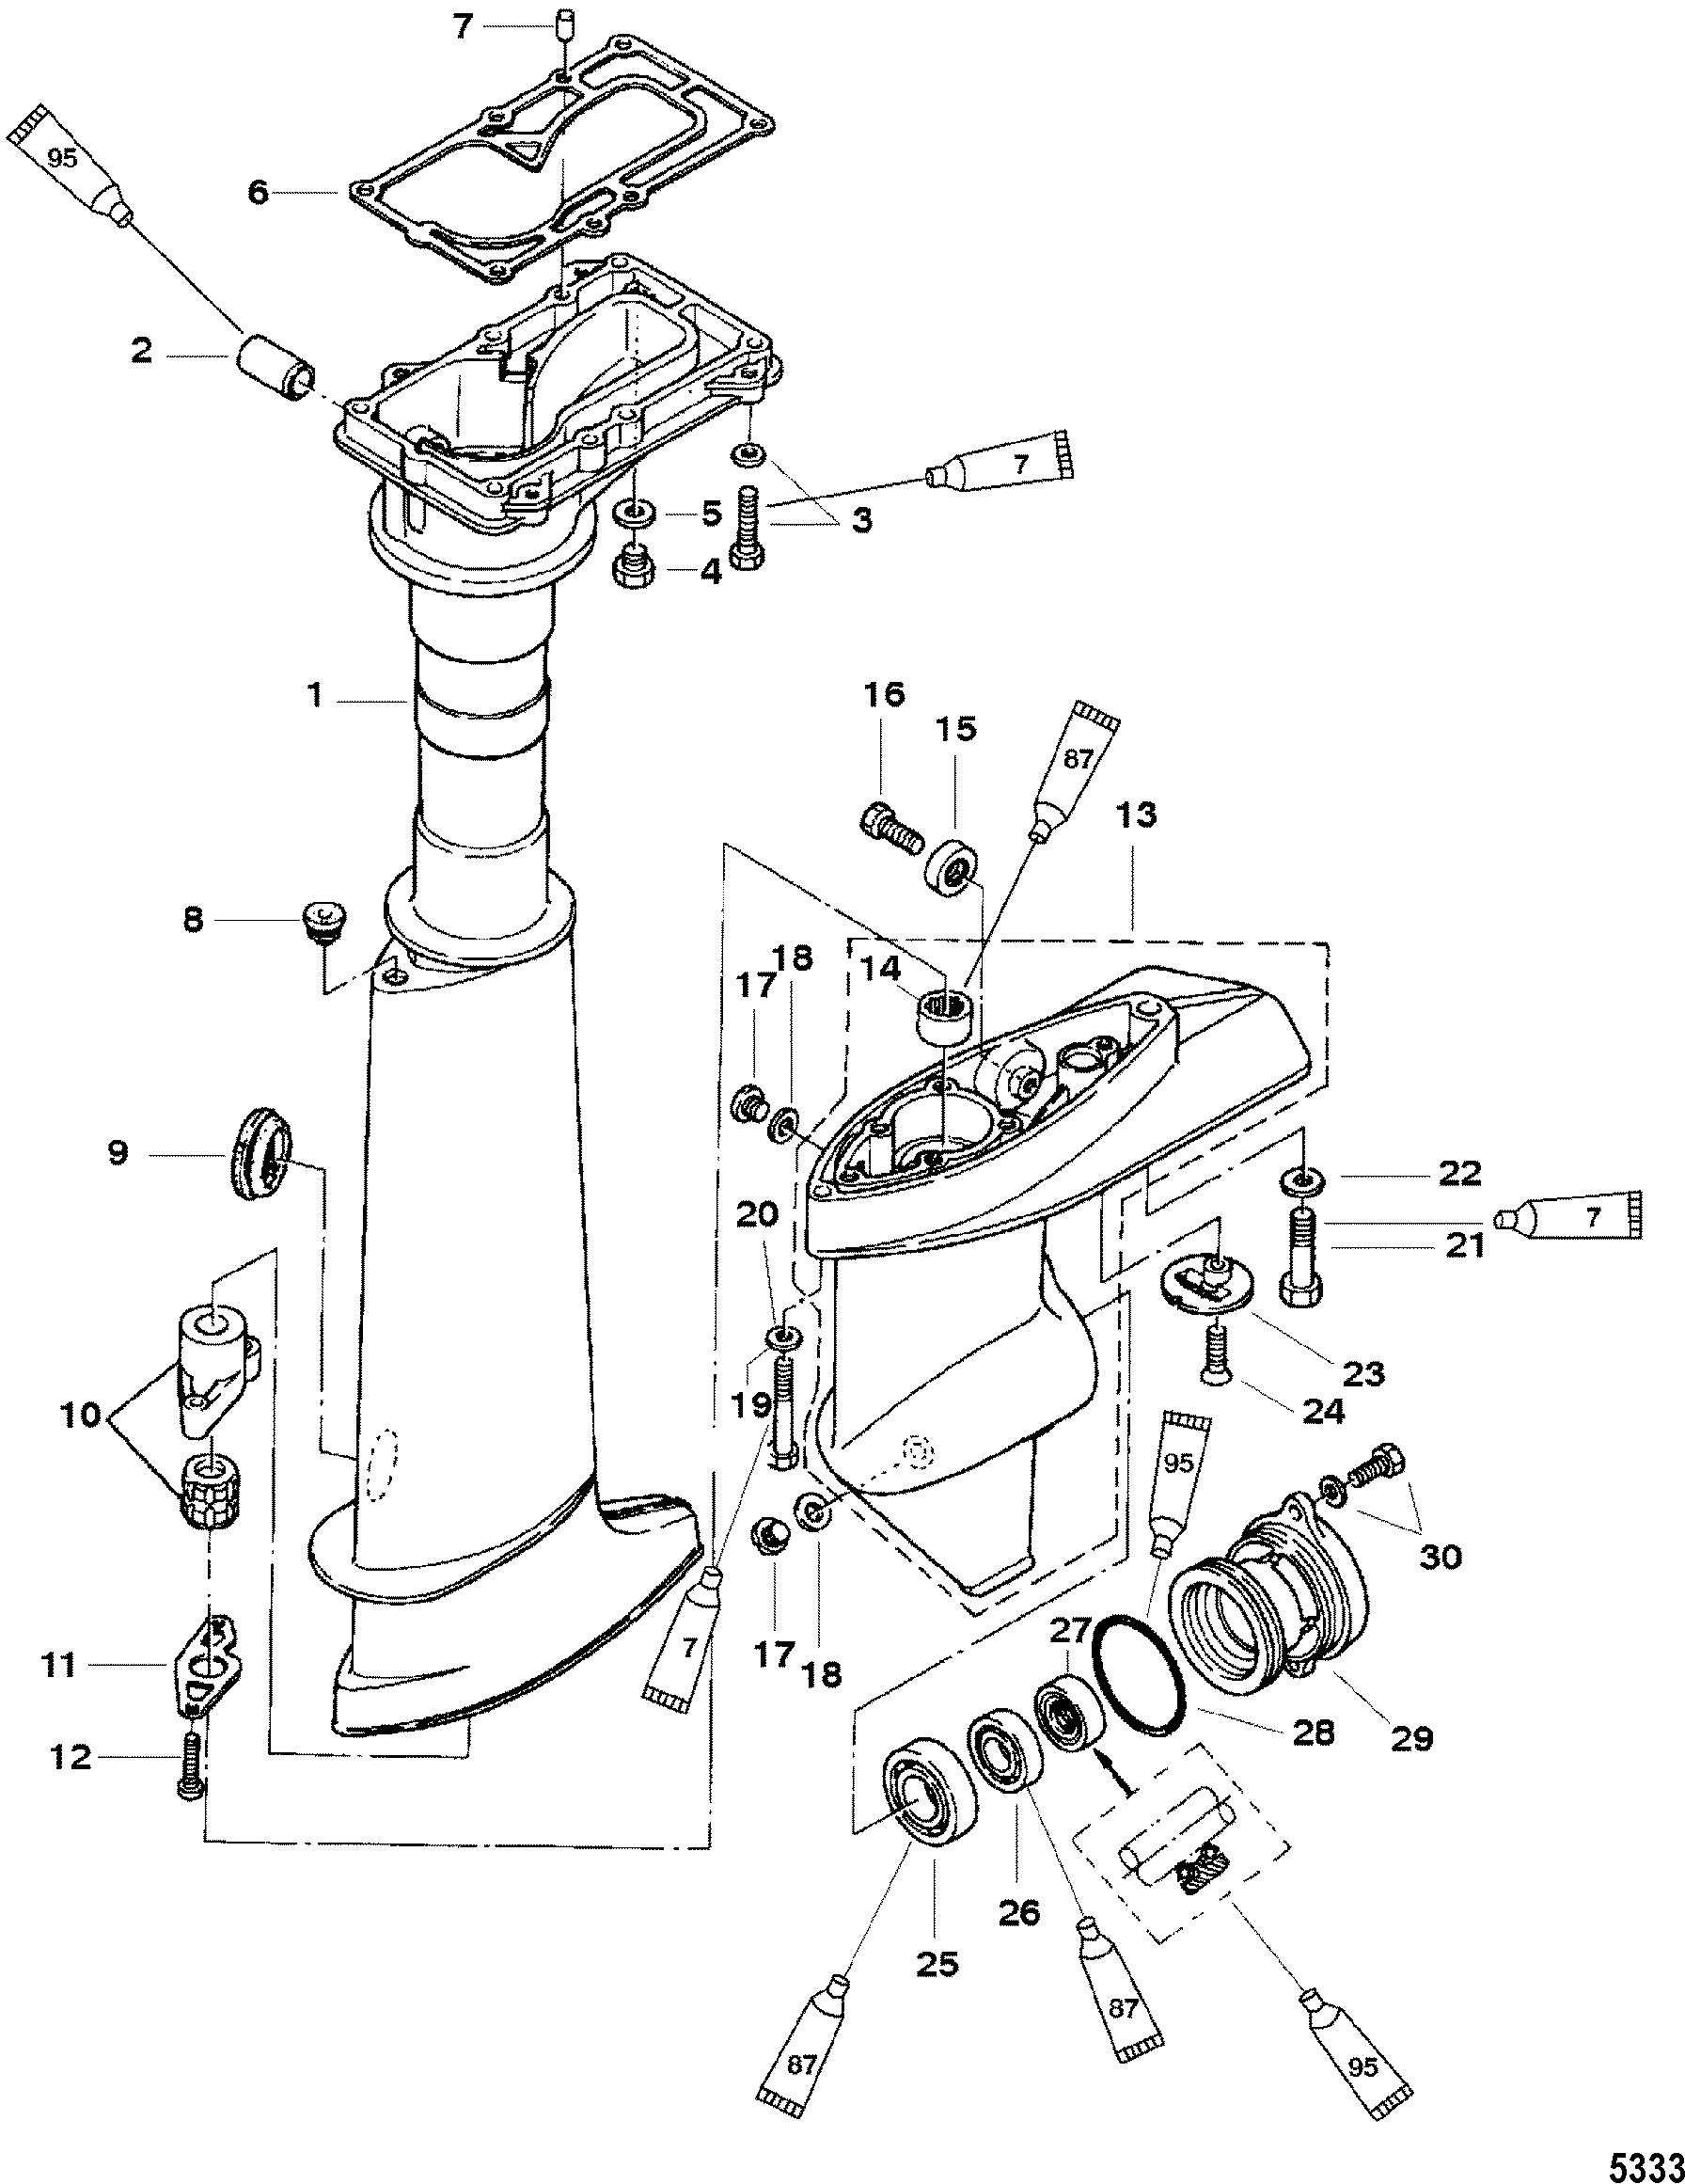 1973 evinrude wiring diagram v4